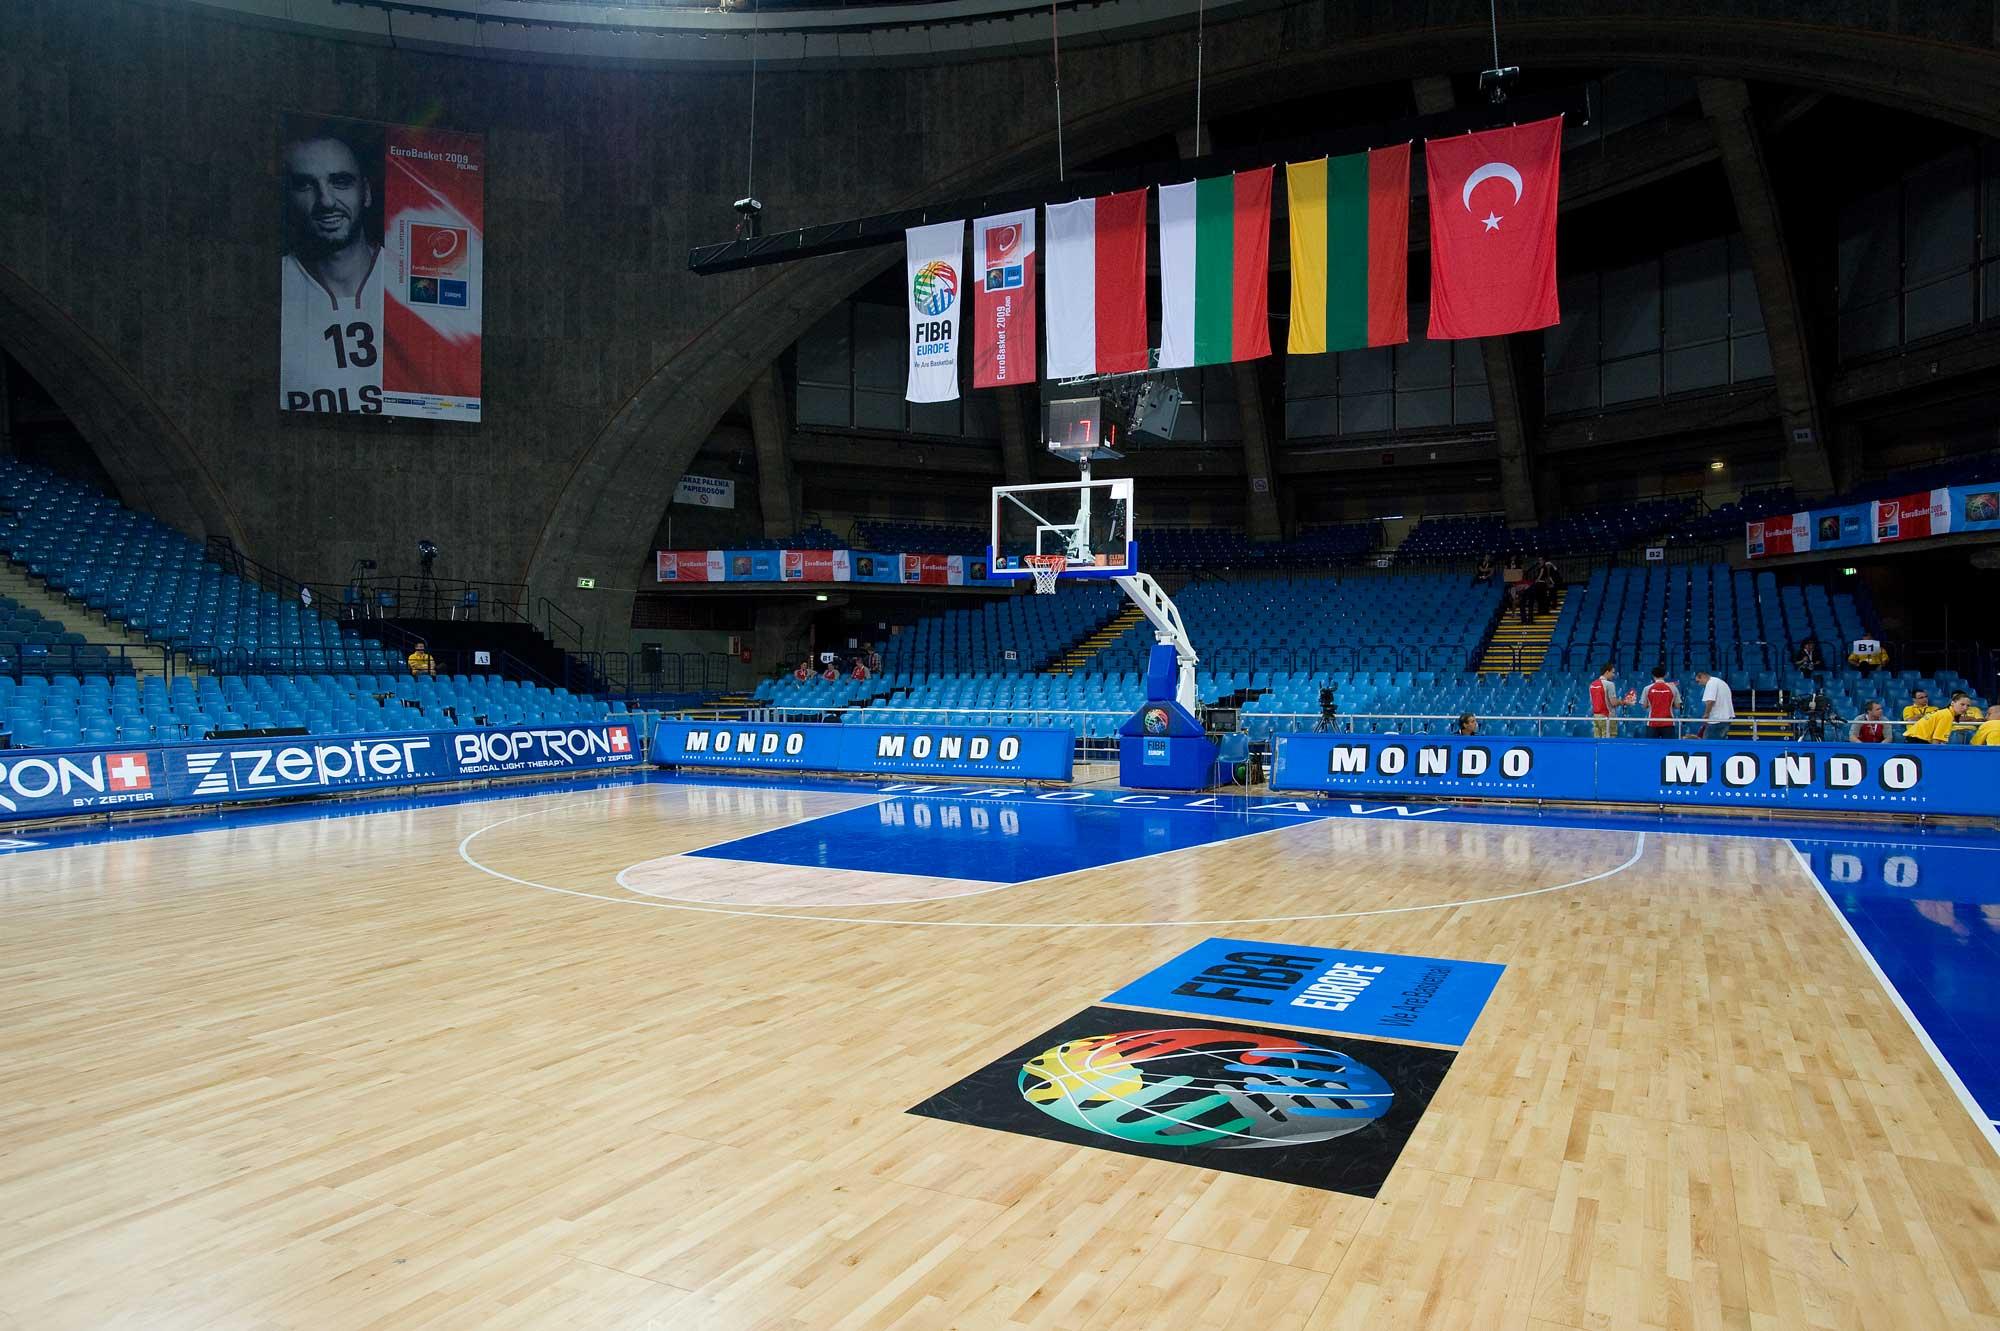 Eurobasket 2009, Wroclaw, Polonia